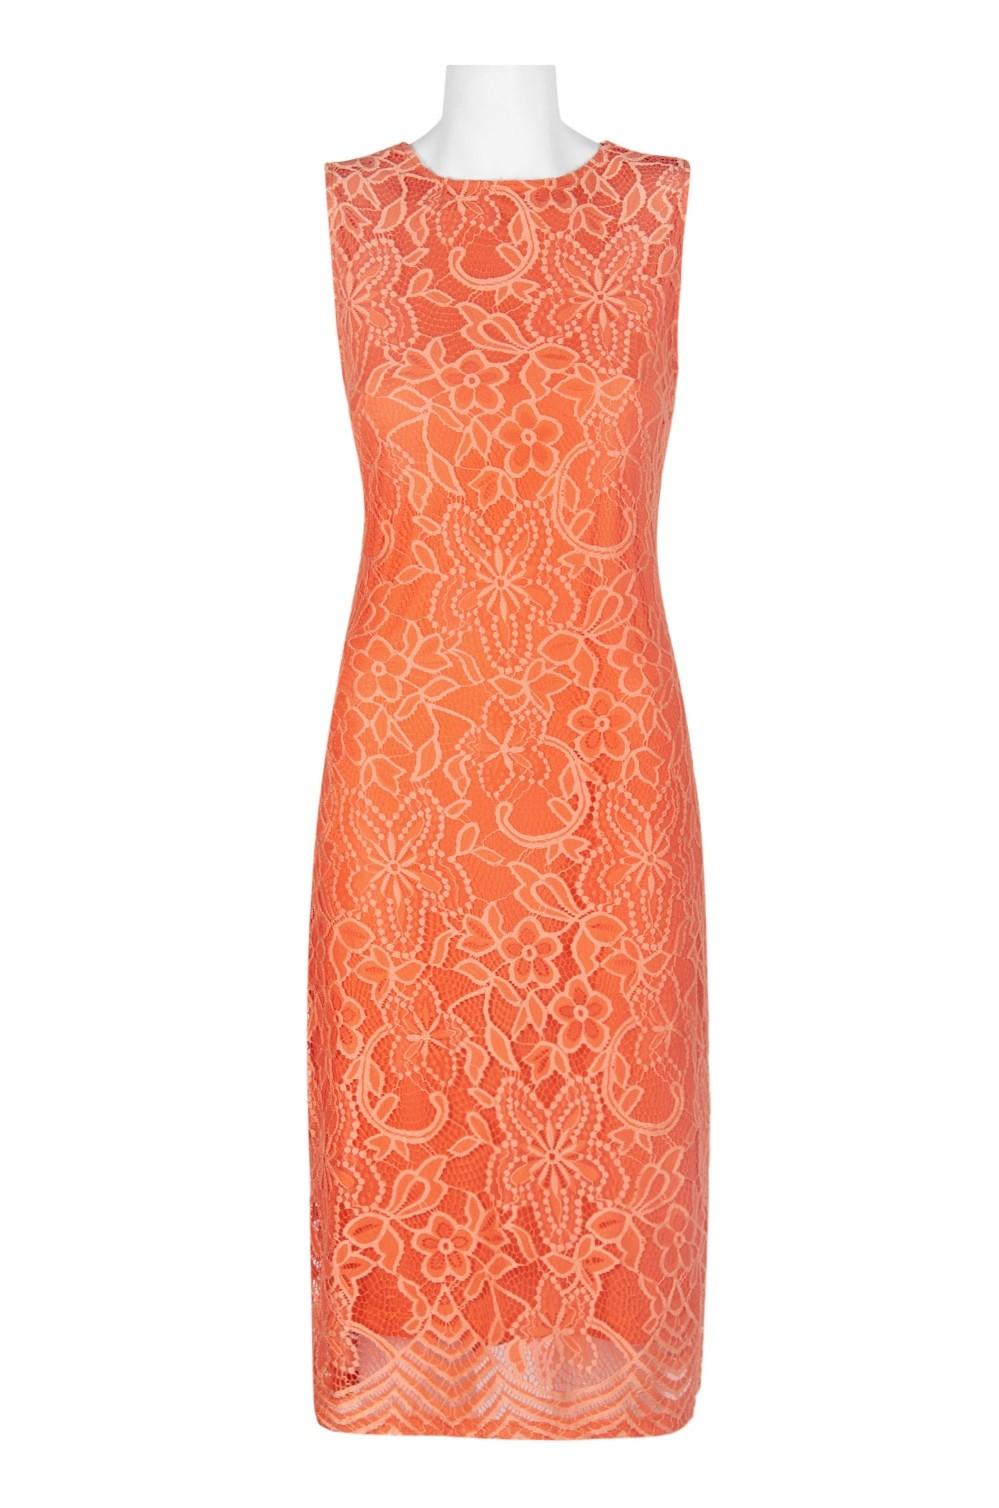 Sharagano Crew Neck Sleeveless Zipper Back Floral Lace Dress